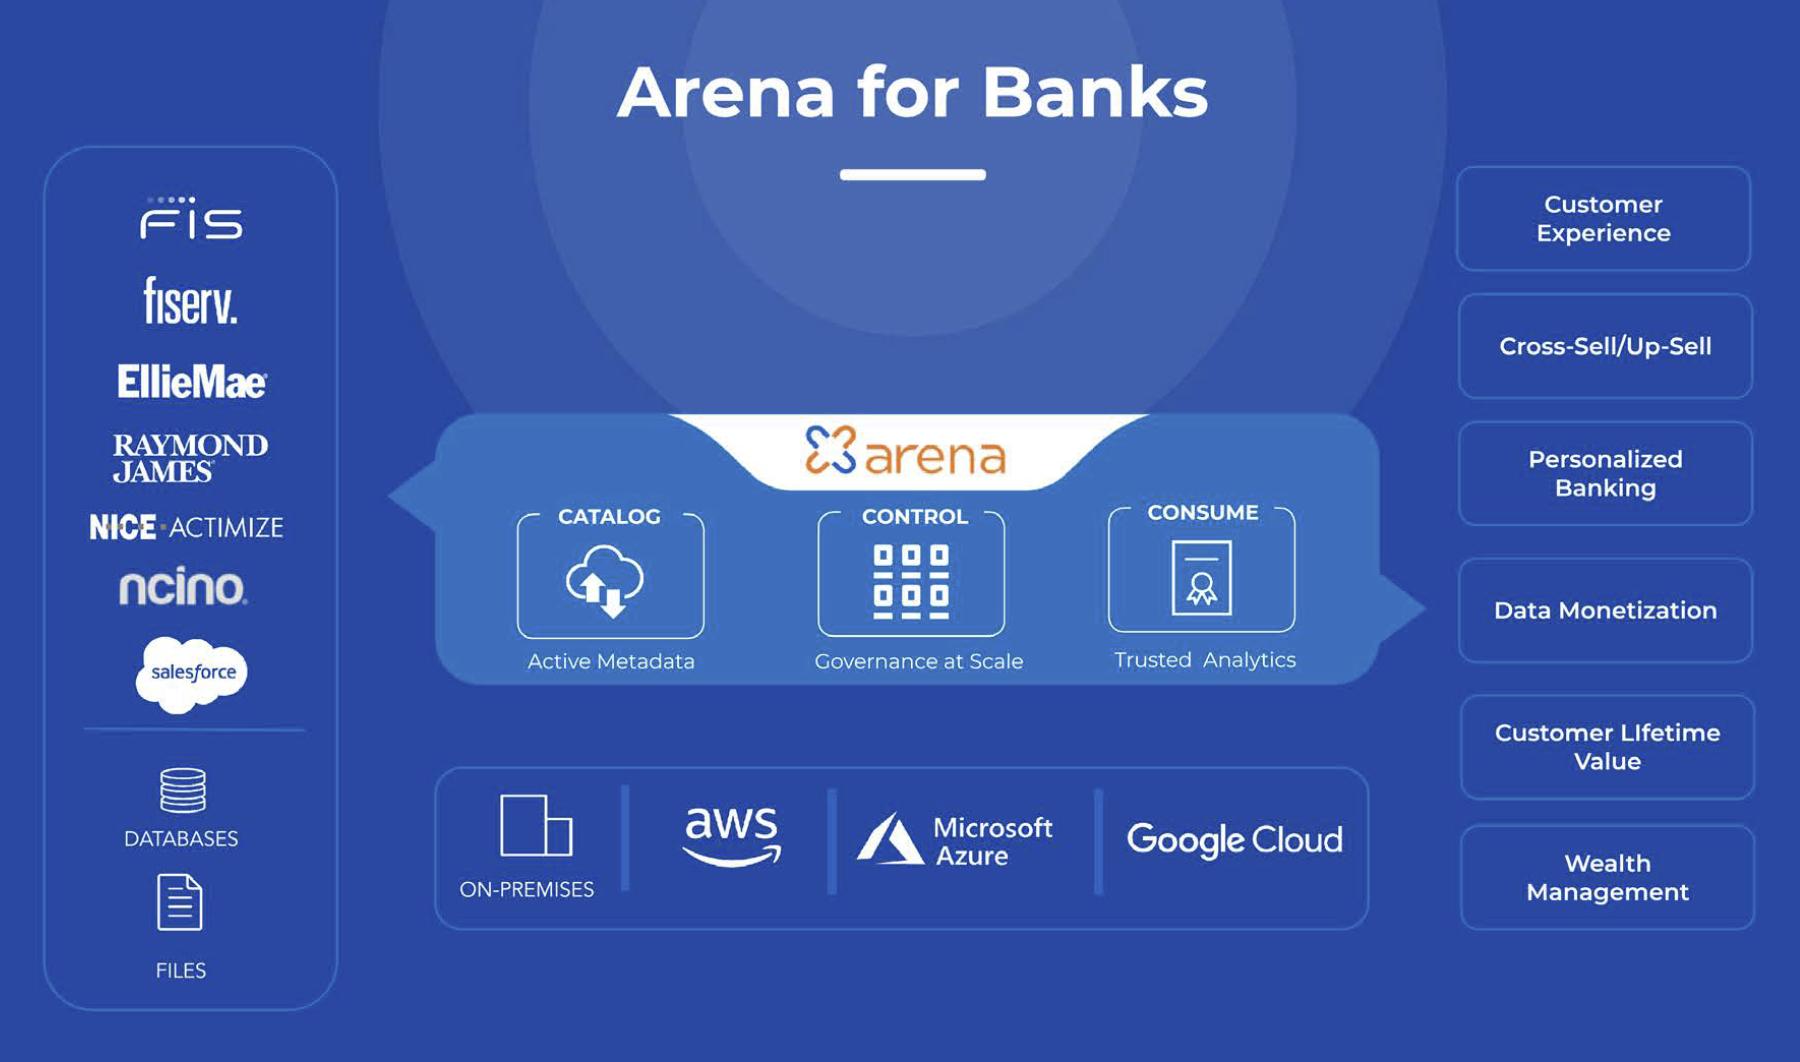 Arena of Banks